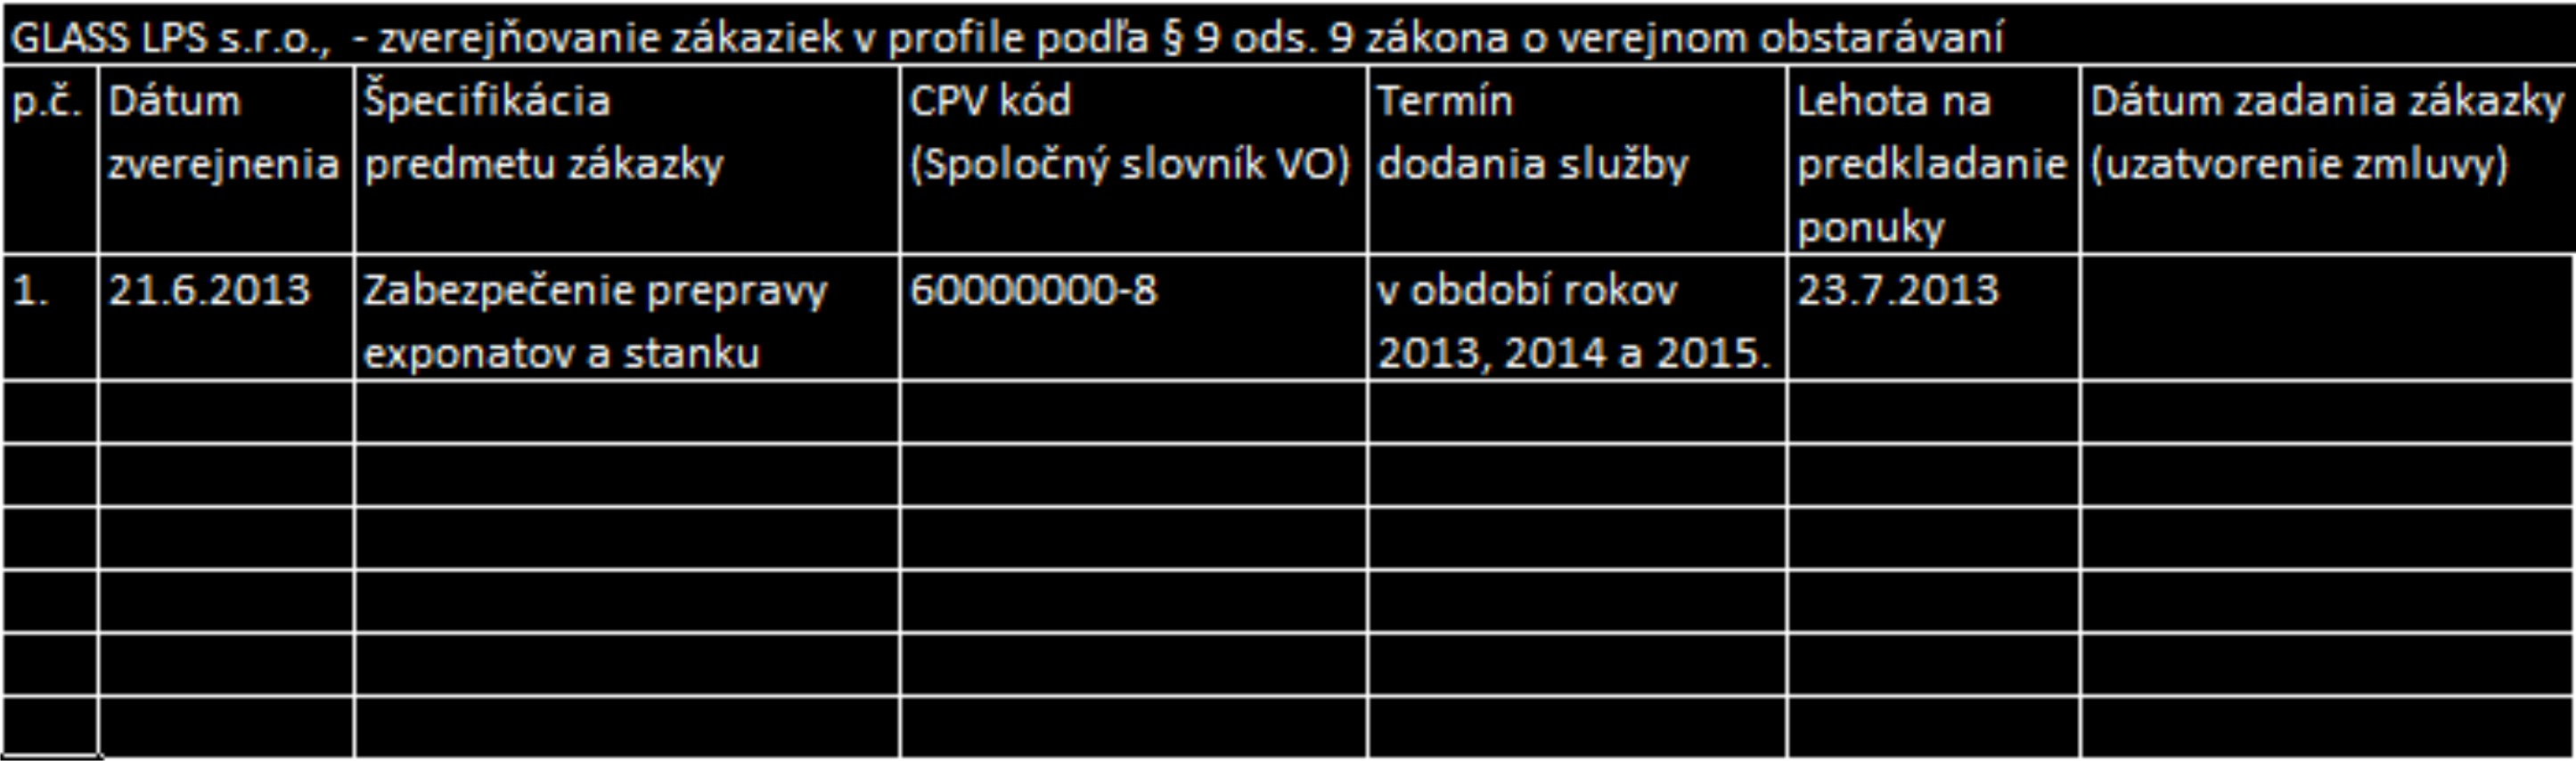 tabulka_zverejnenie_doprava.jpg